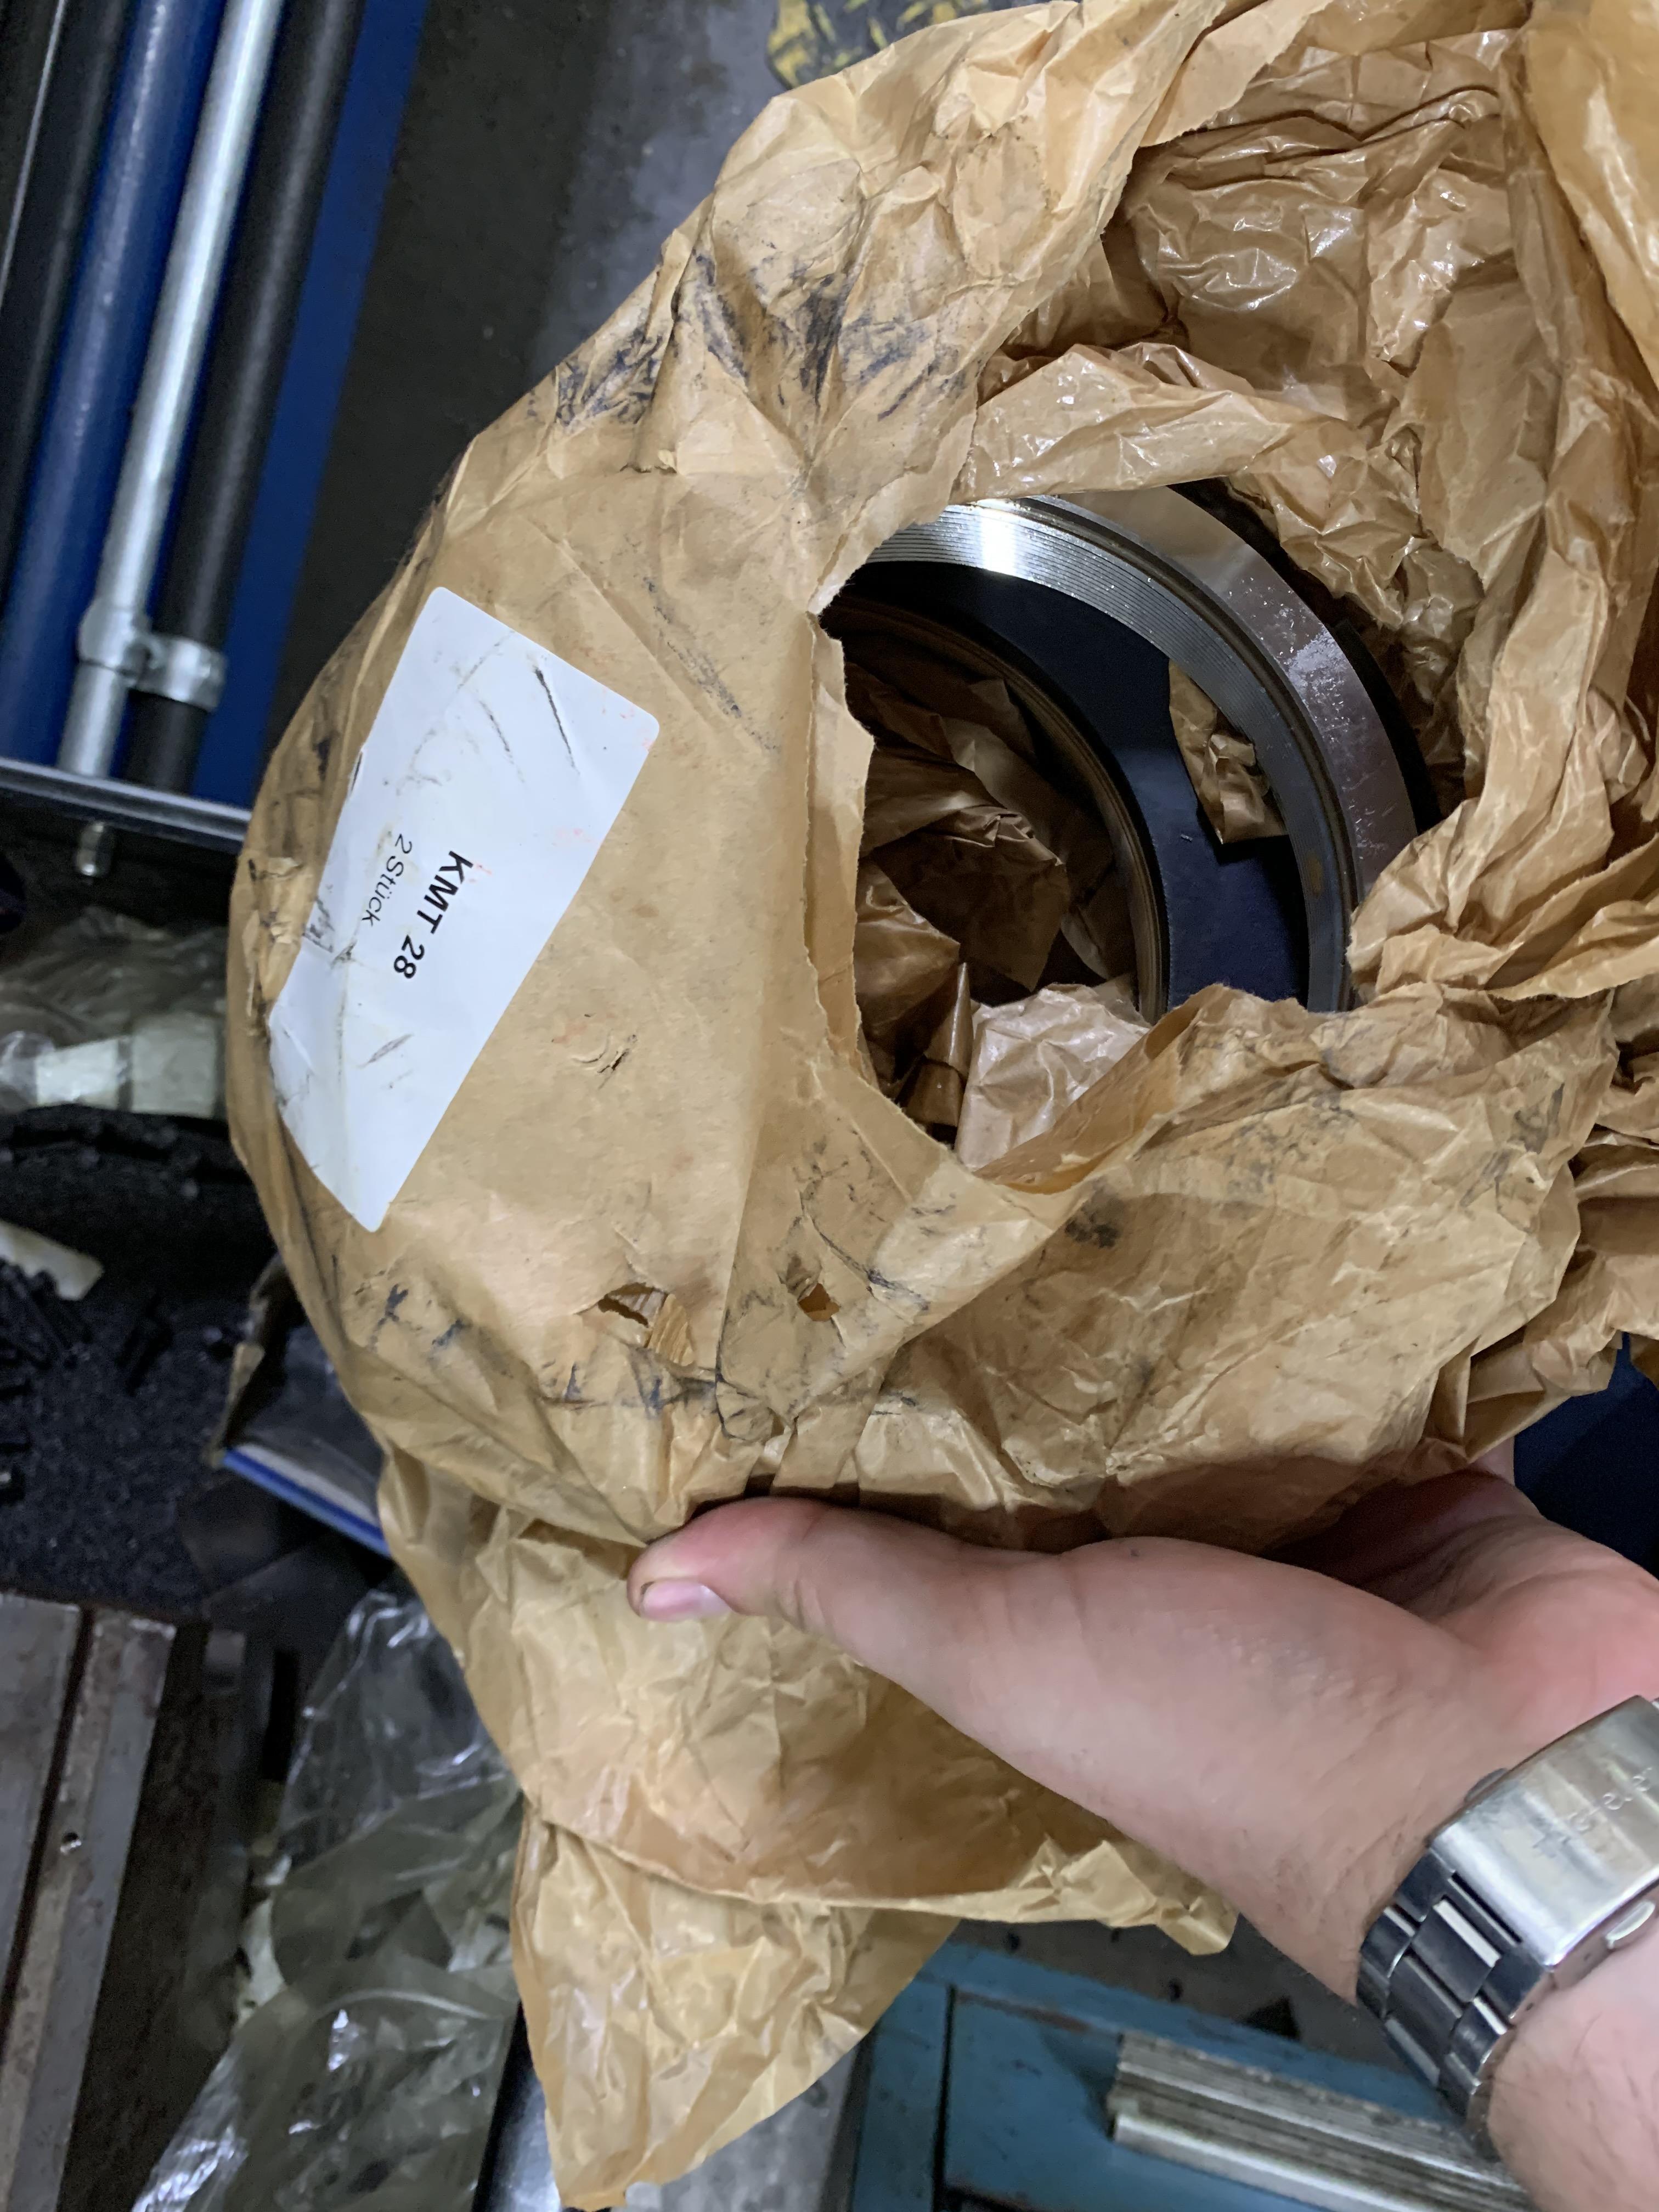 "6"" UNISON MODEL 6"" MS RH ELECTRIC CNC MULTI-STACK TUBE BENDER; S/N 2715, JOB NO. ME 4-410,(NEW 2014) - Image 62 of 72"